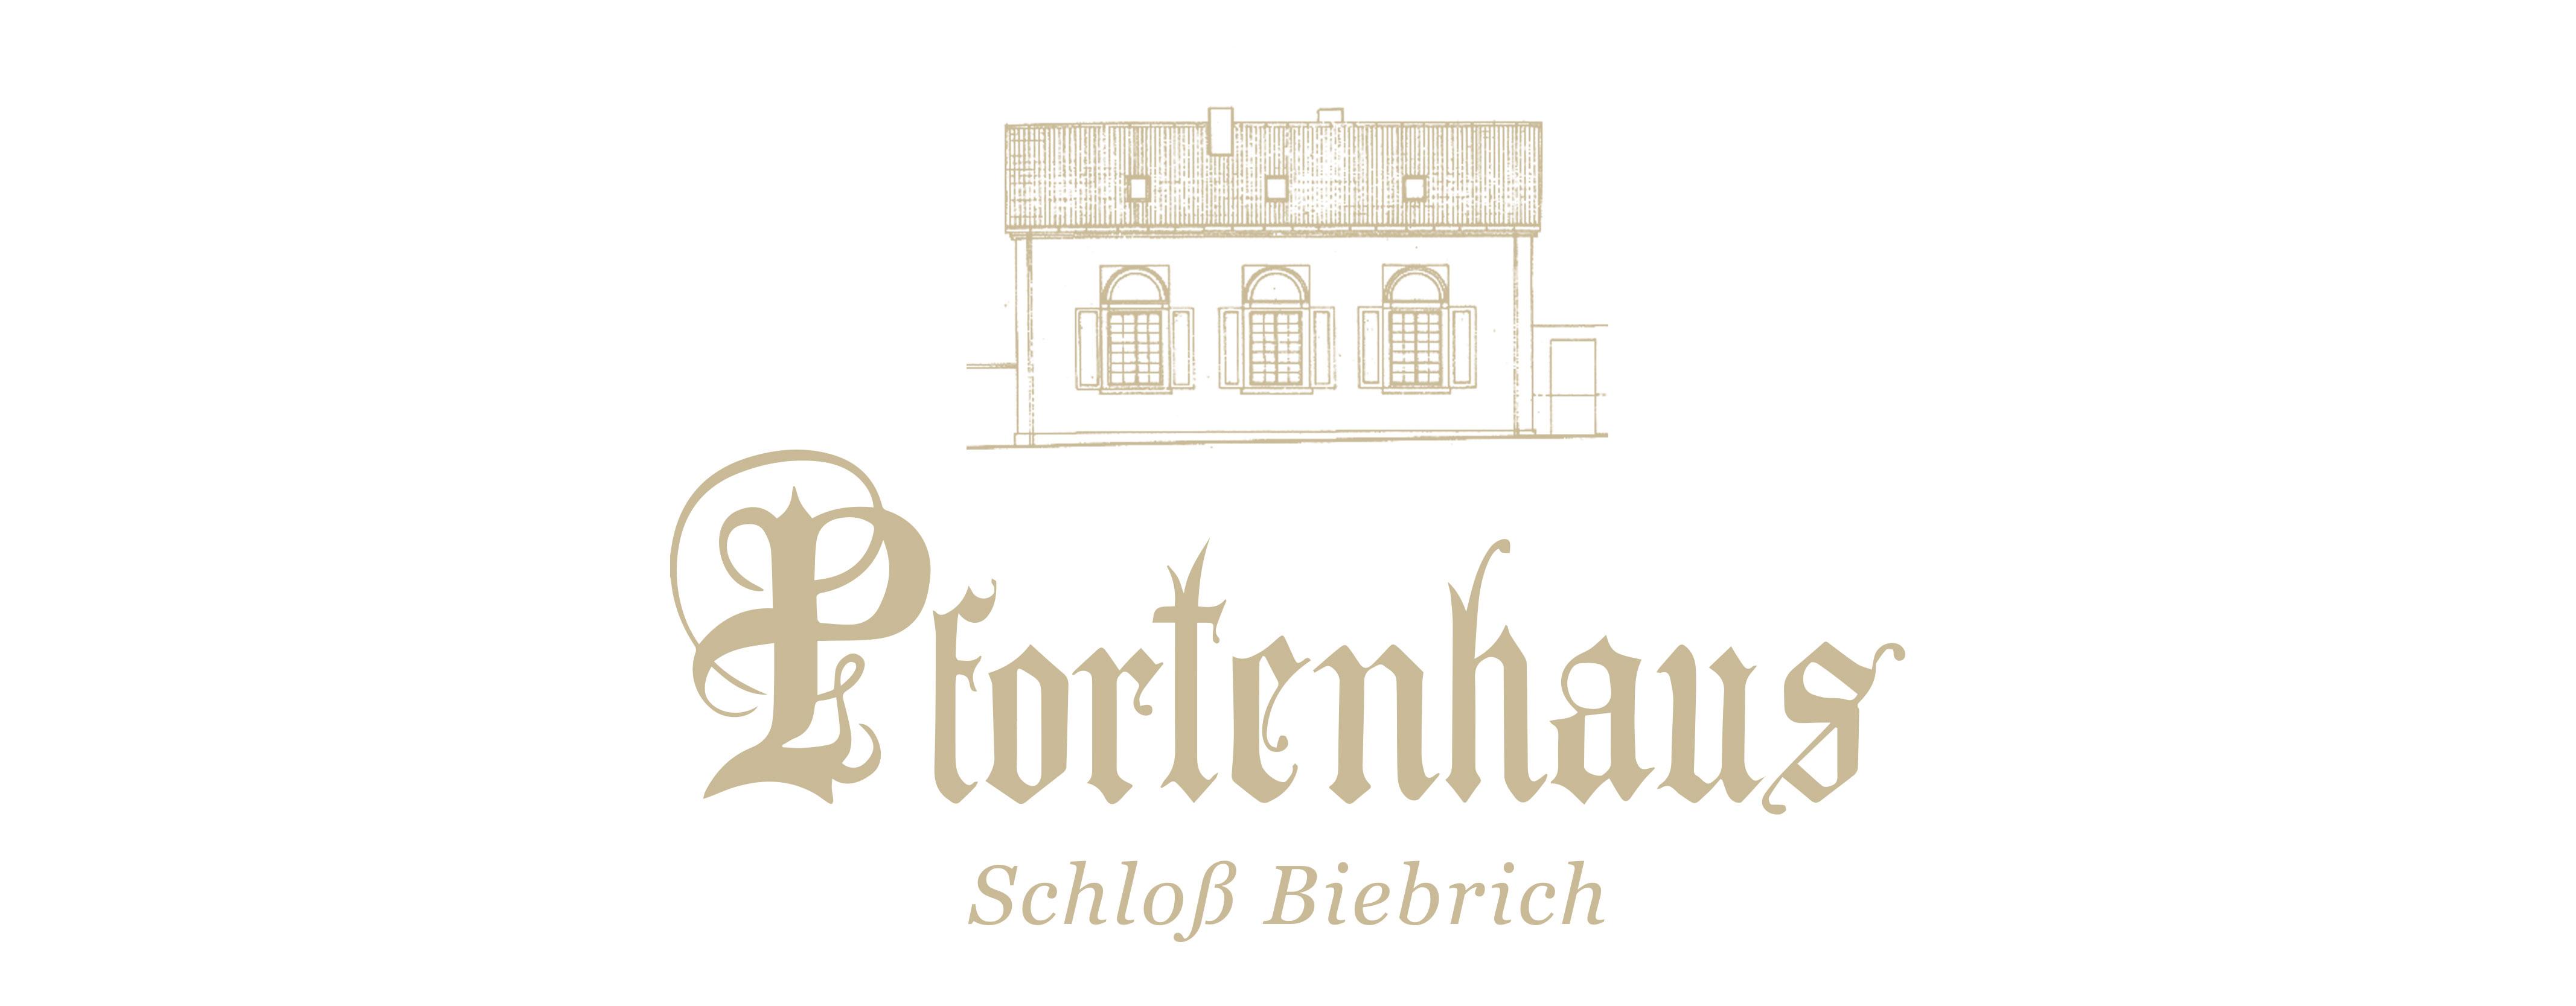 Das Pfortenhaus am Biebricher Schloßpark